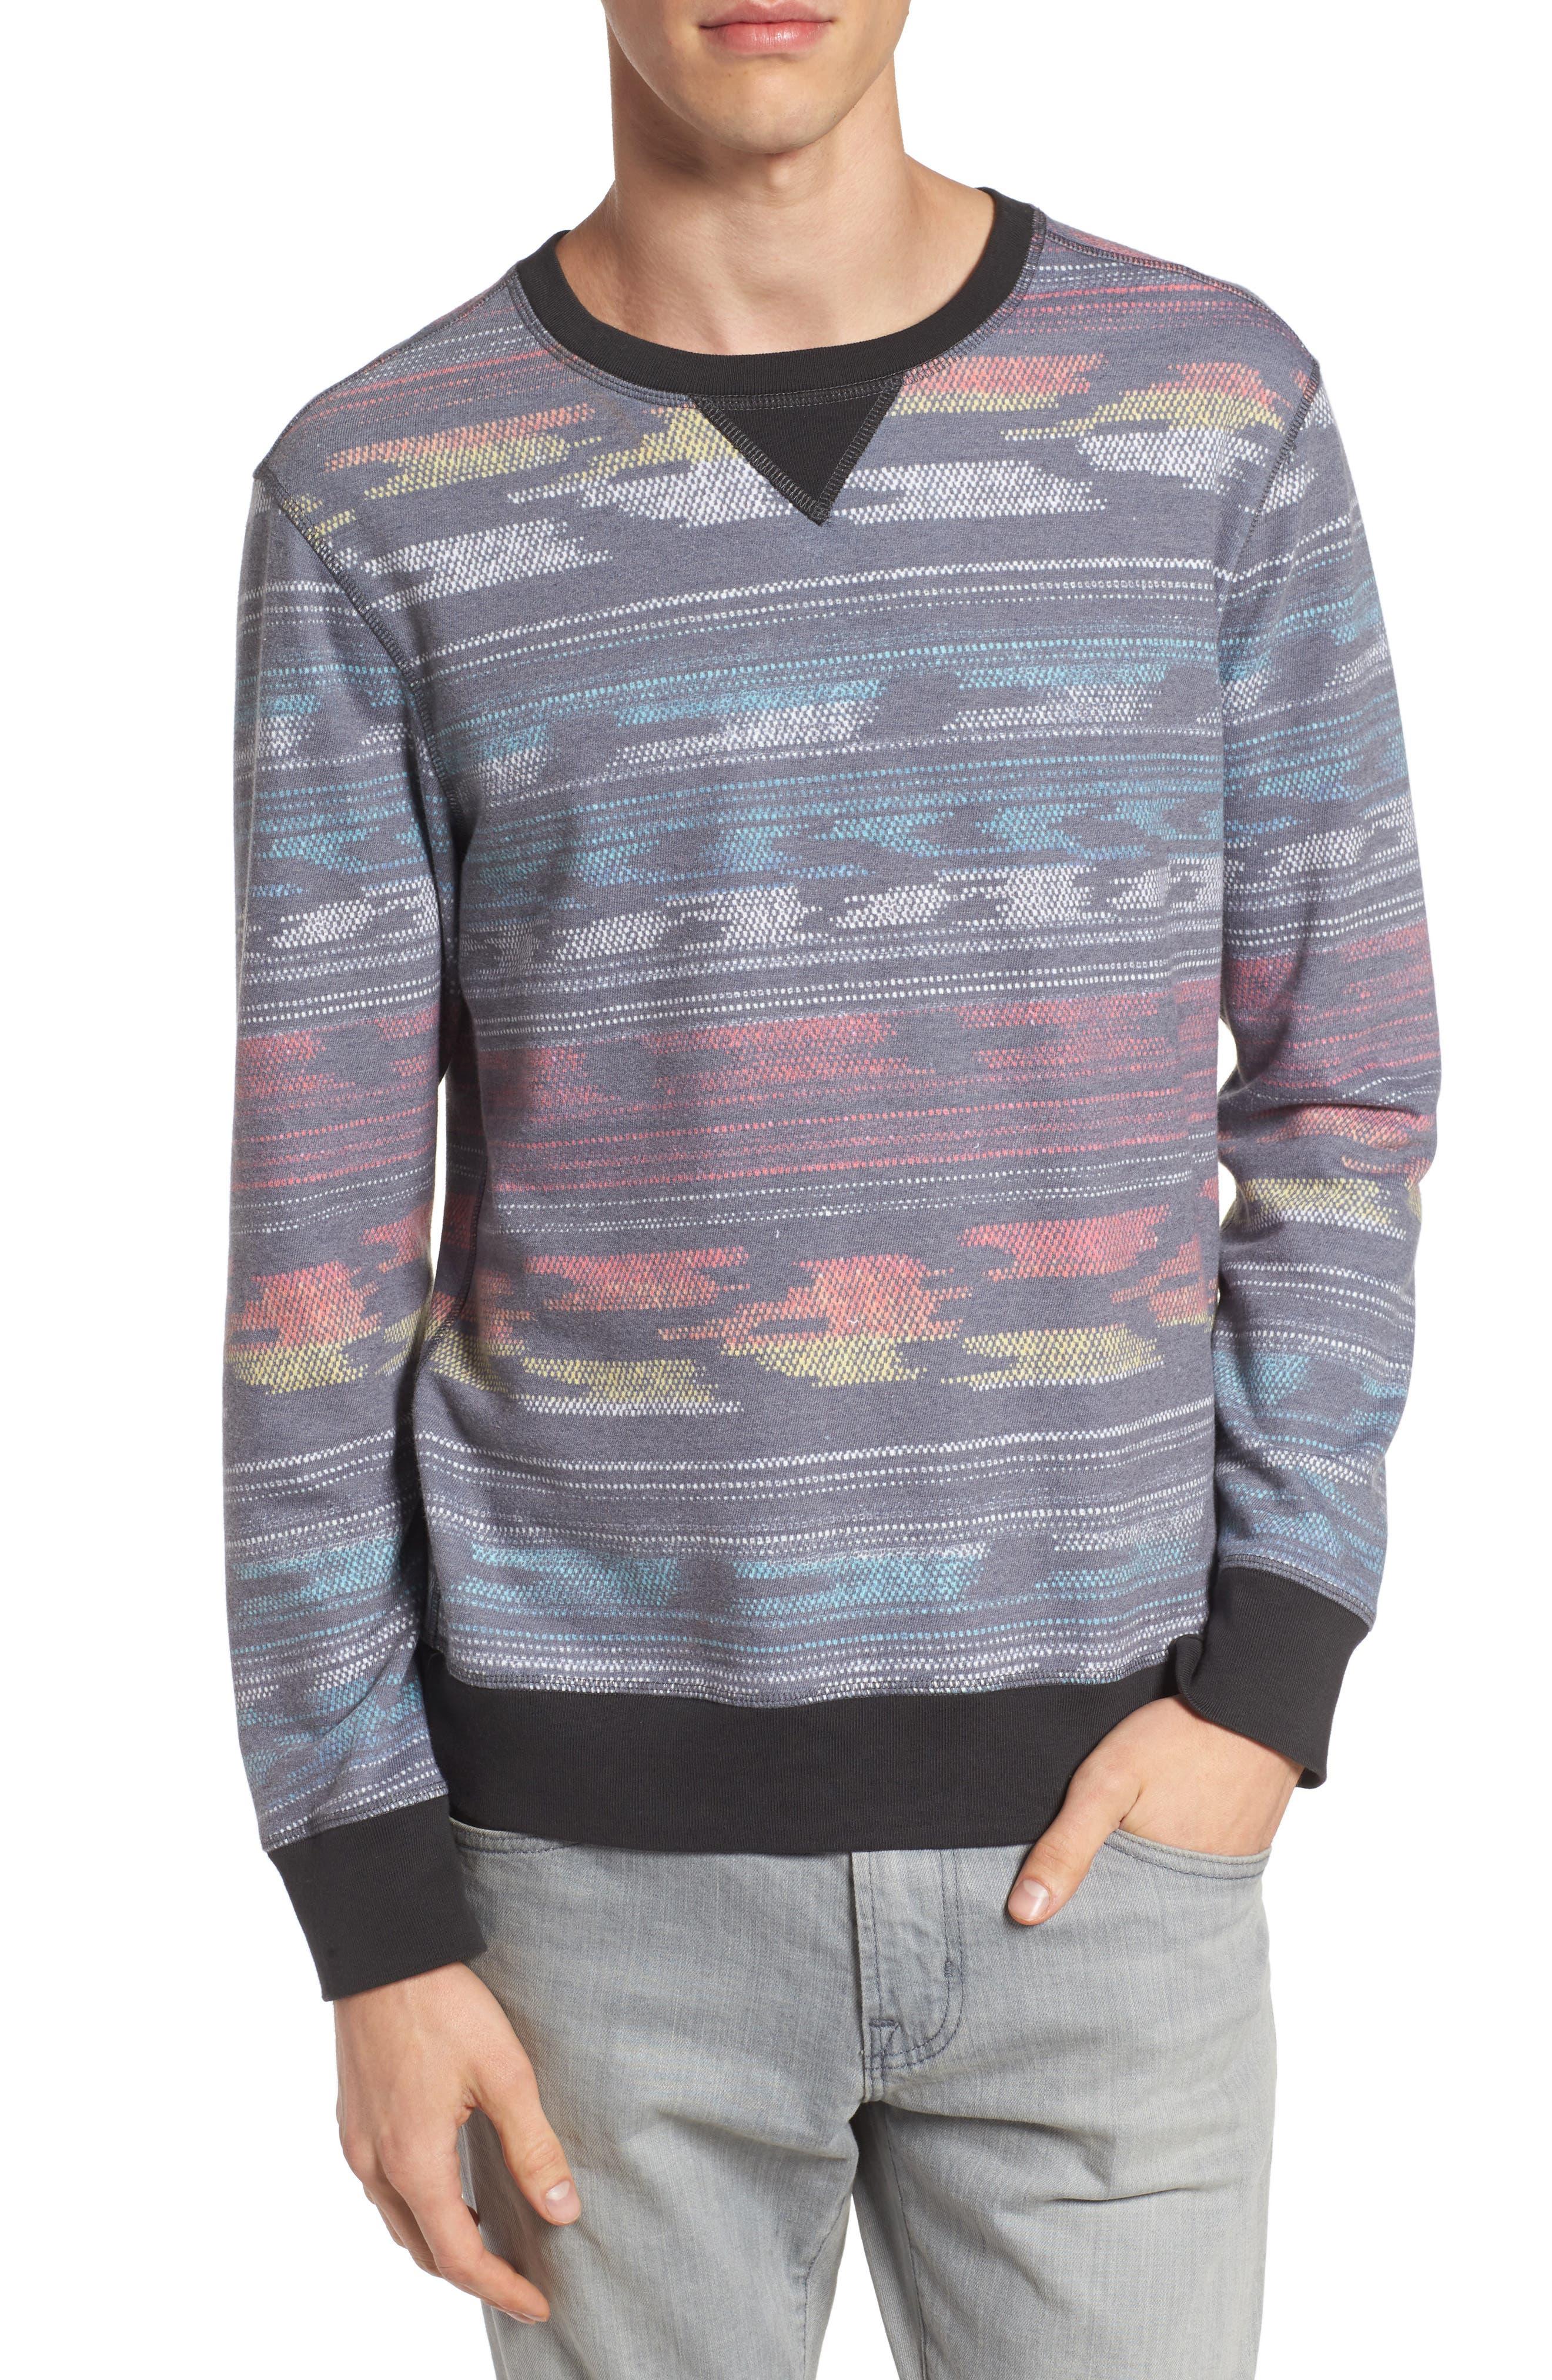 Madrugada Pullover,                         Main,                         color, Madrugada